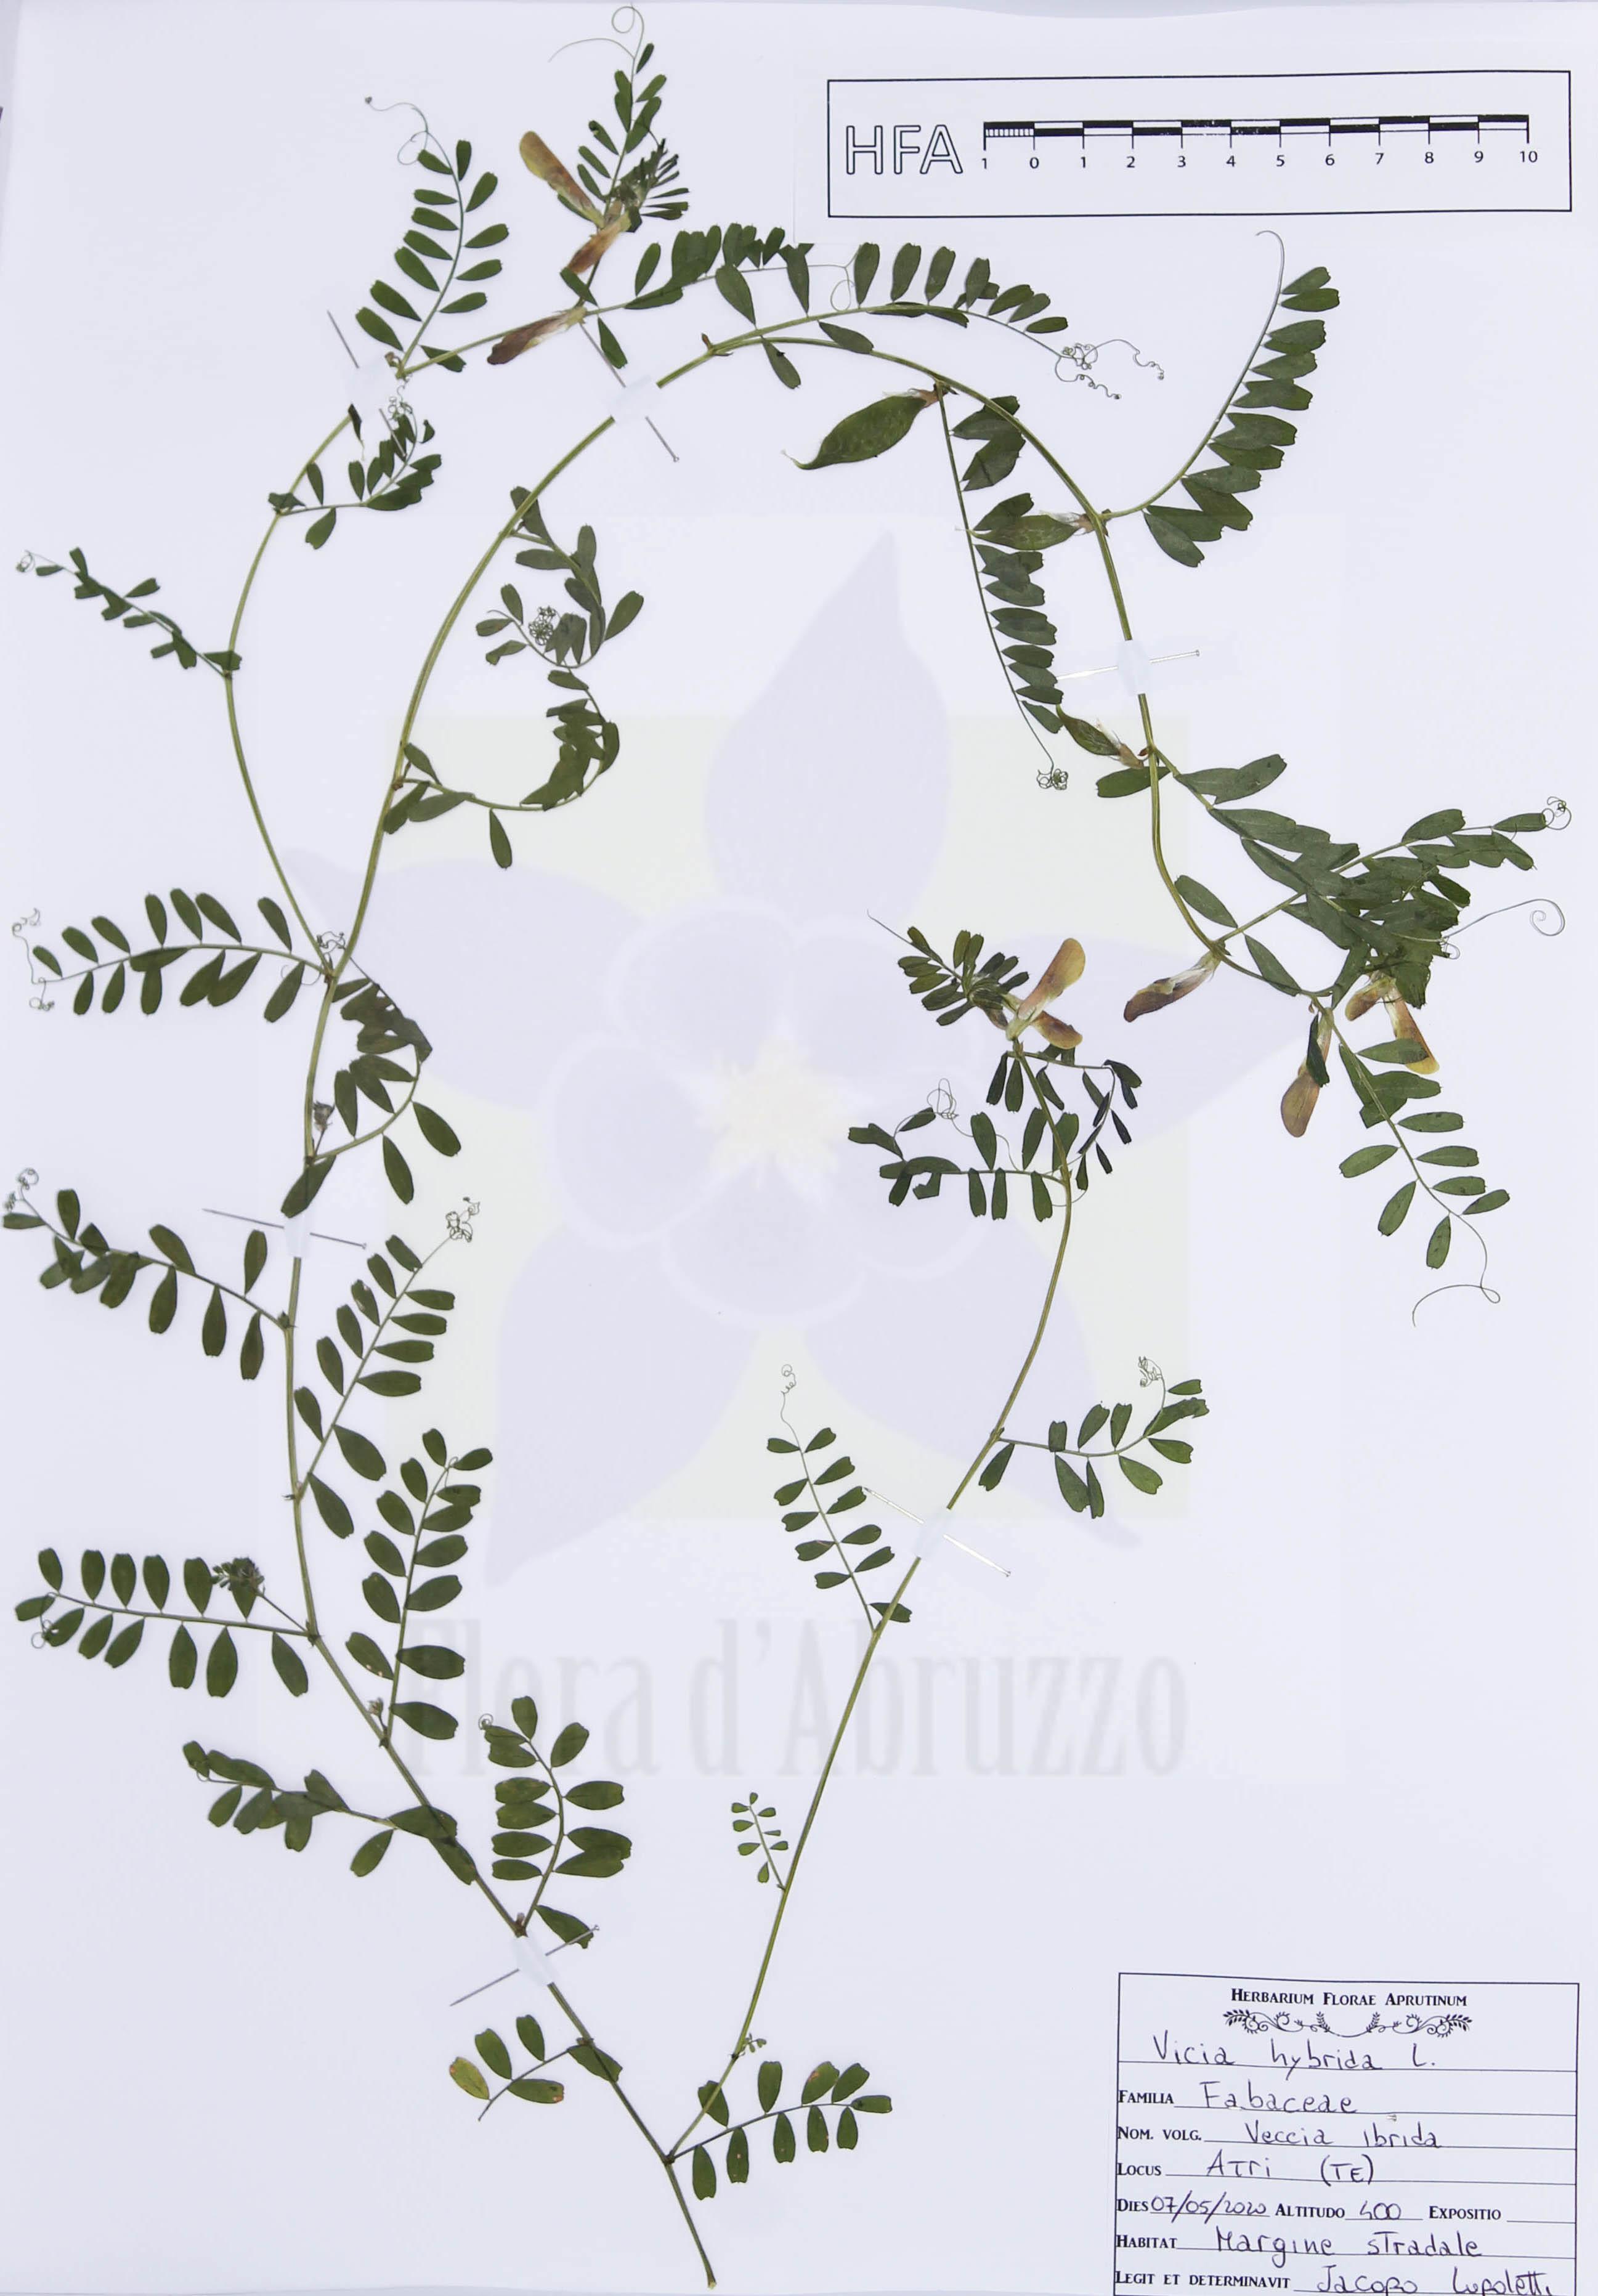 Vicia hybridaL.